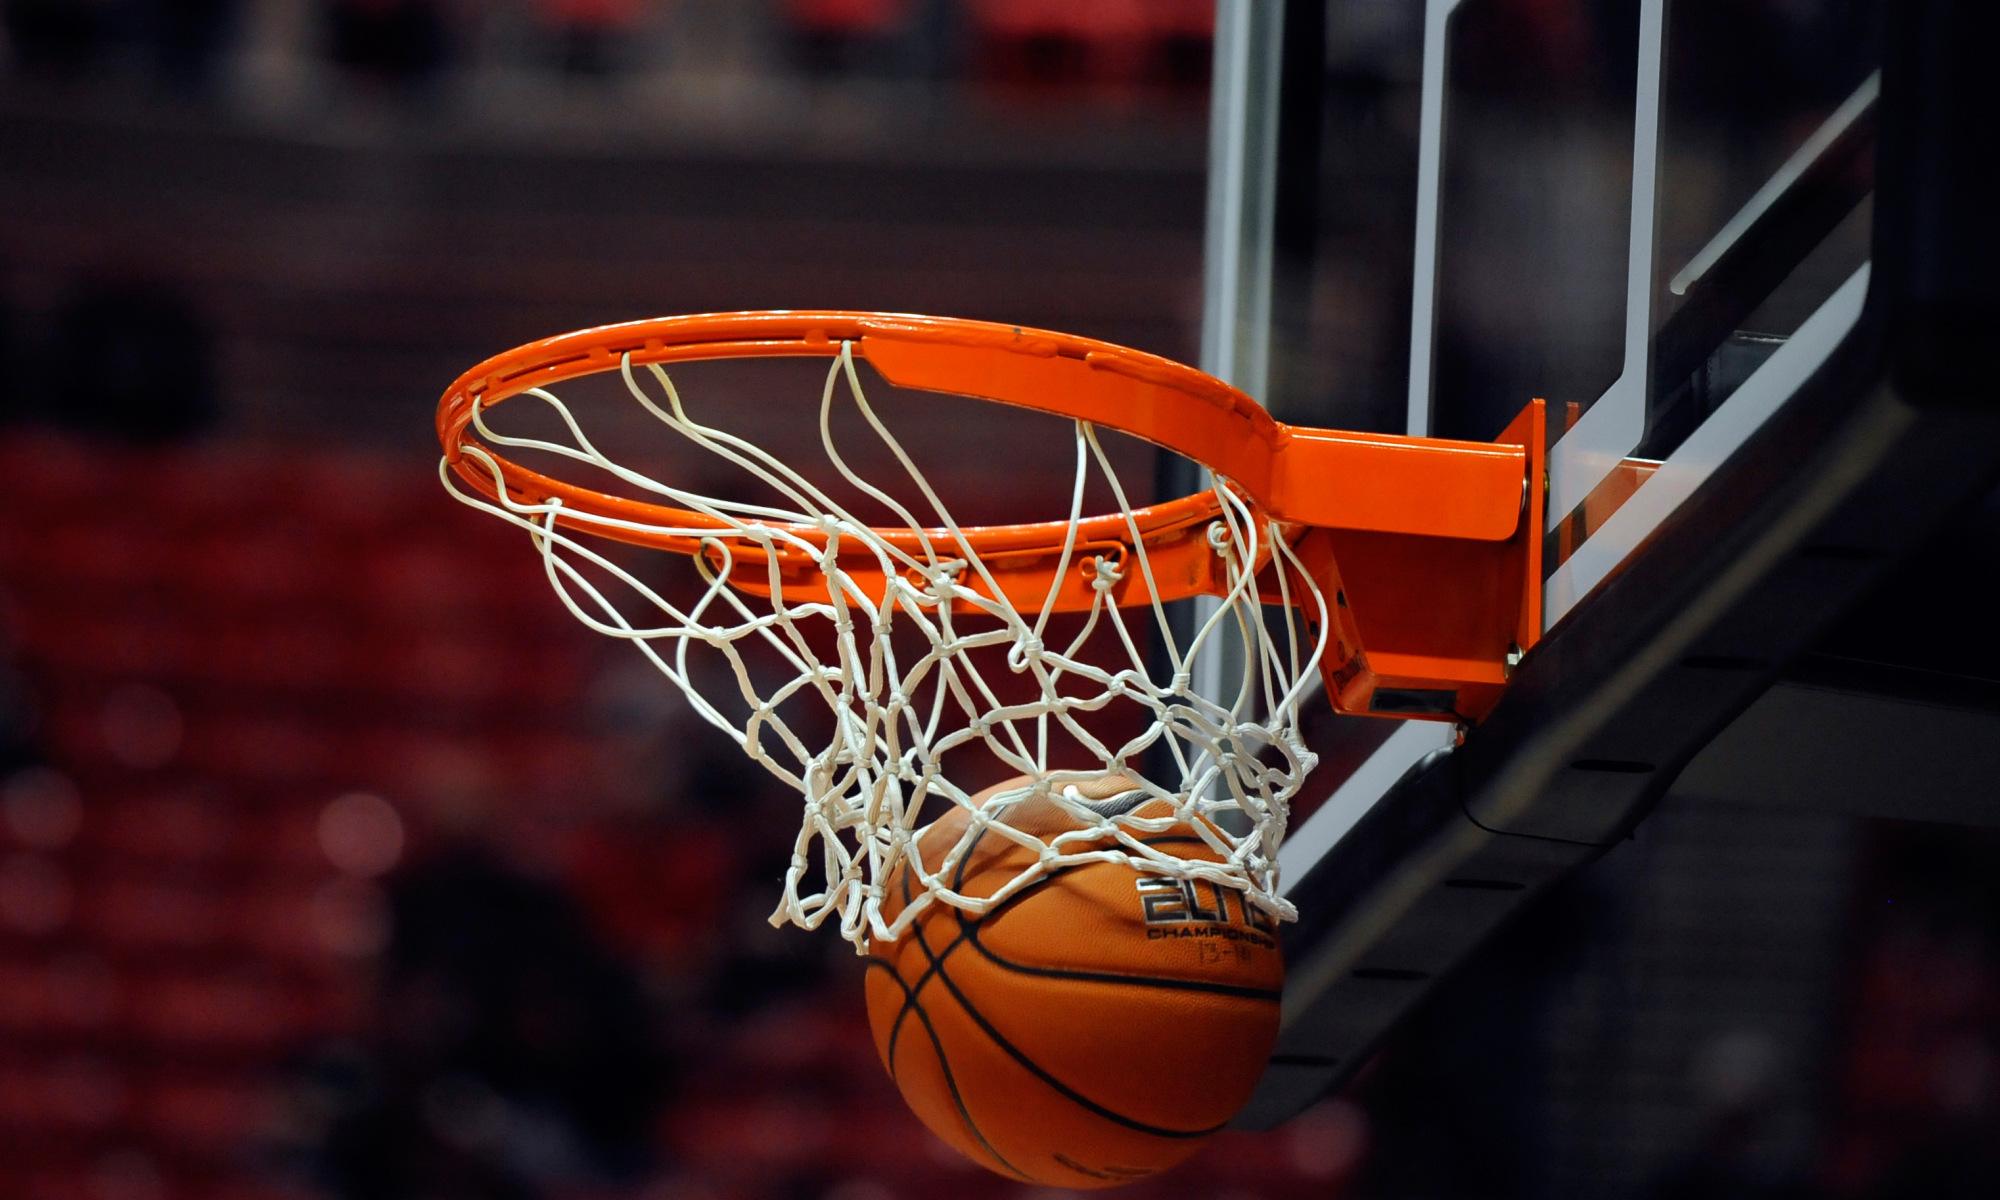 RWA Sportswear - Basketball | Lifetime 71524 XL Adjustable Portable Basketball System